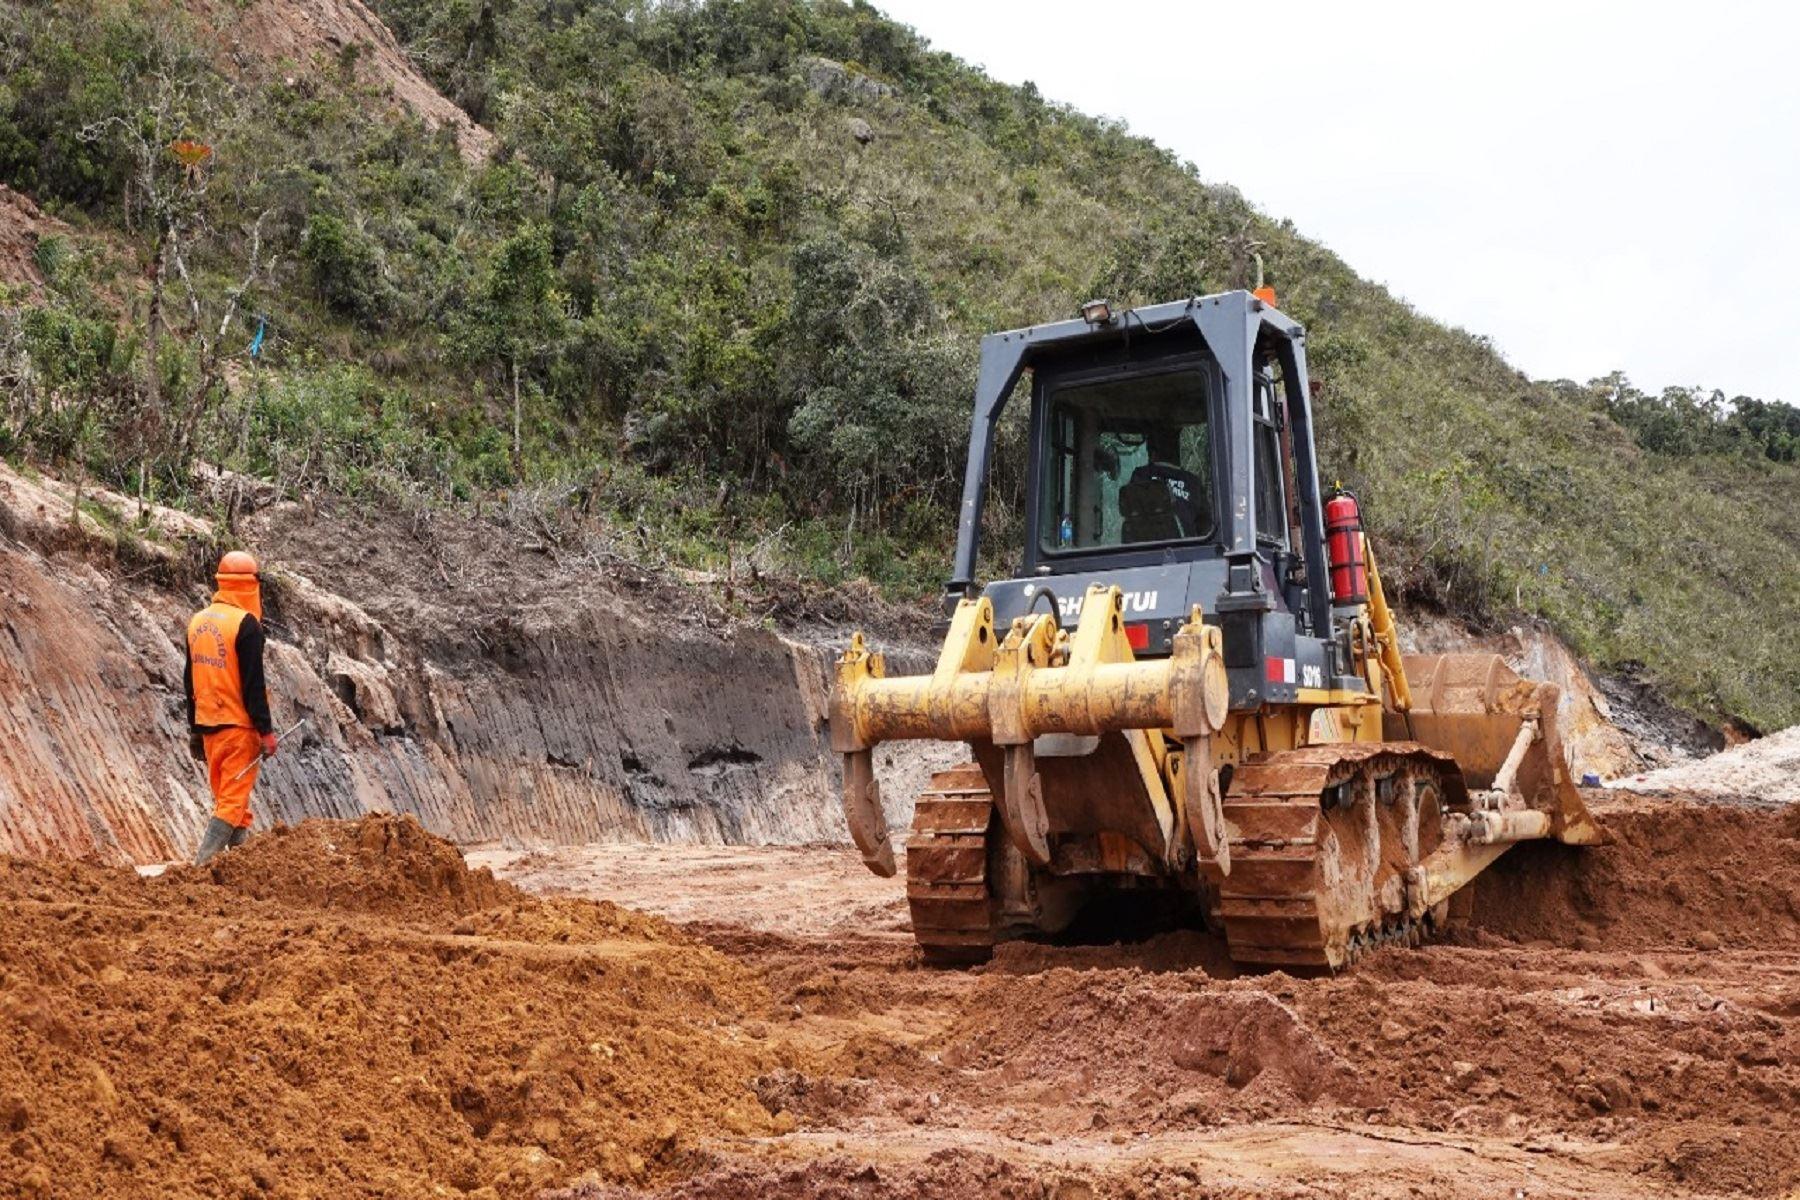 Obras de infraestructura vial. Foto: ANDINA/Difusión